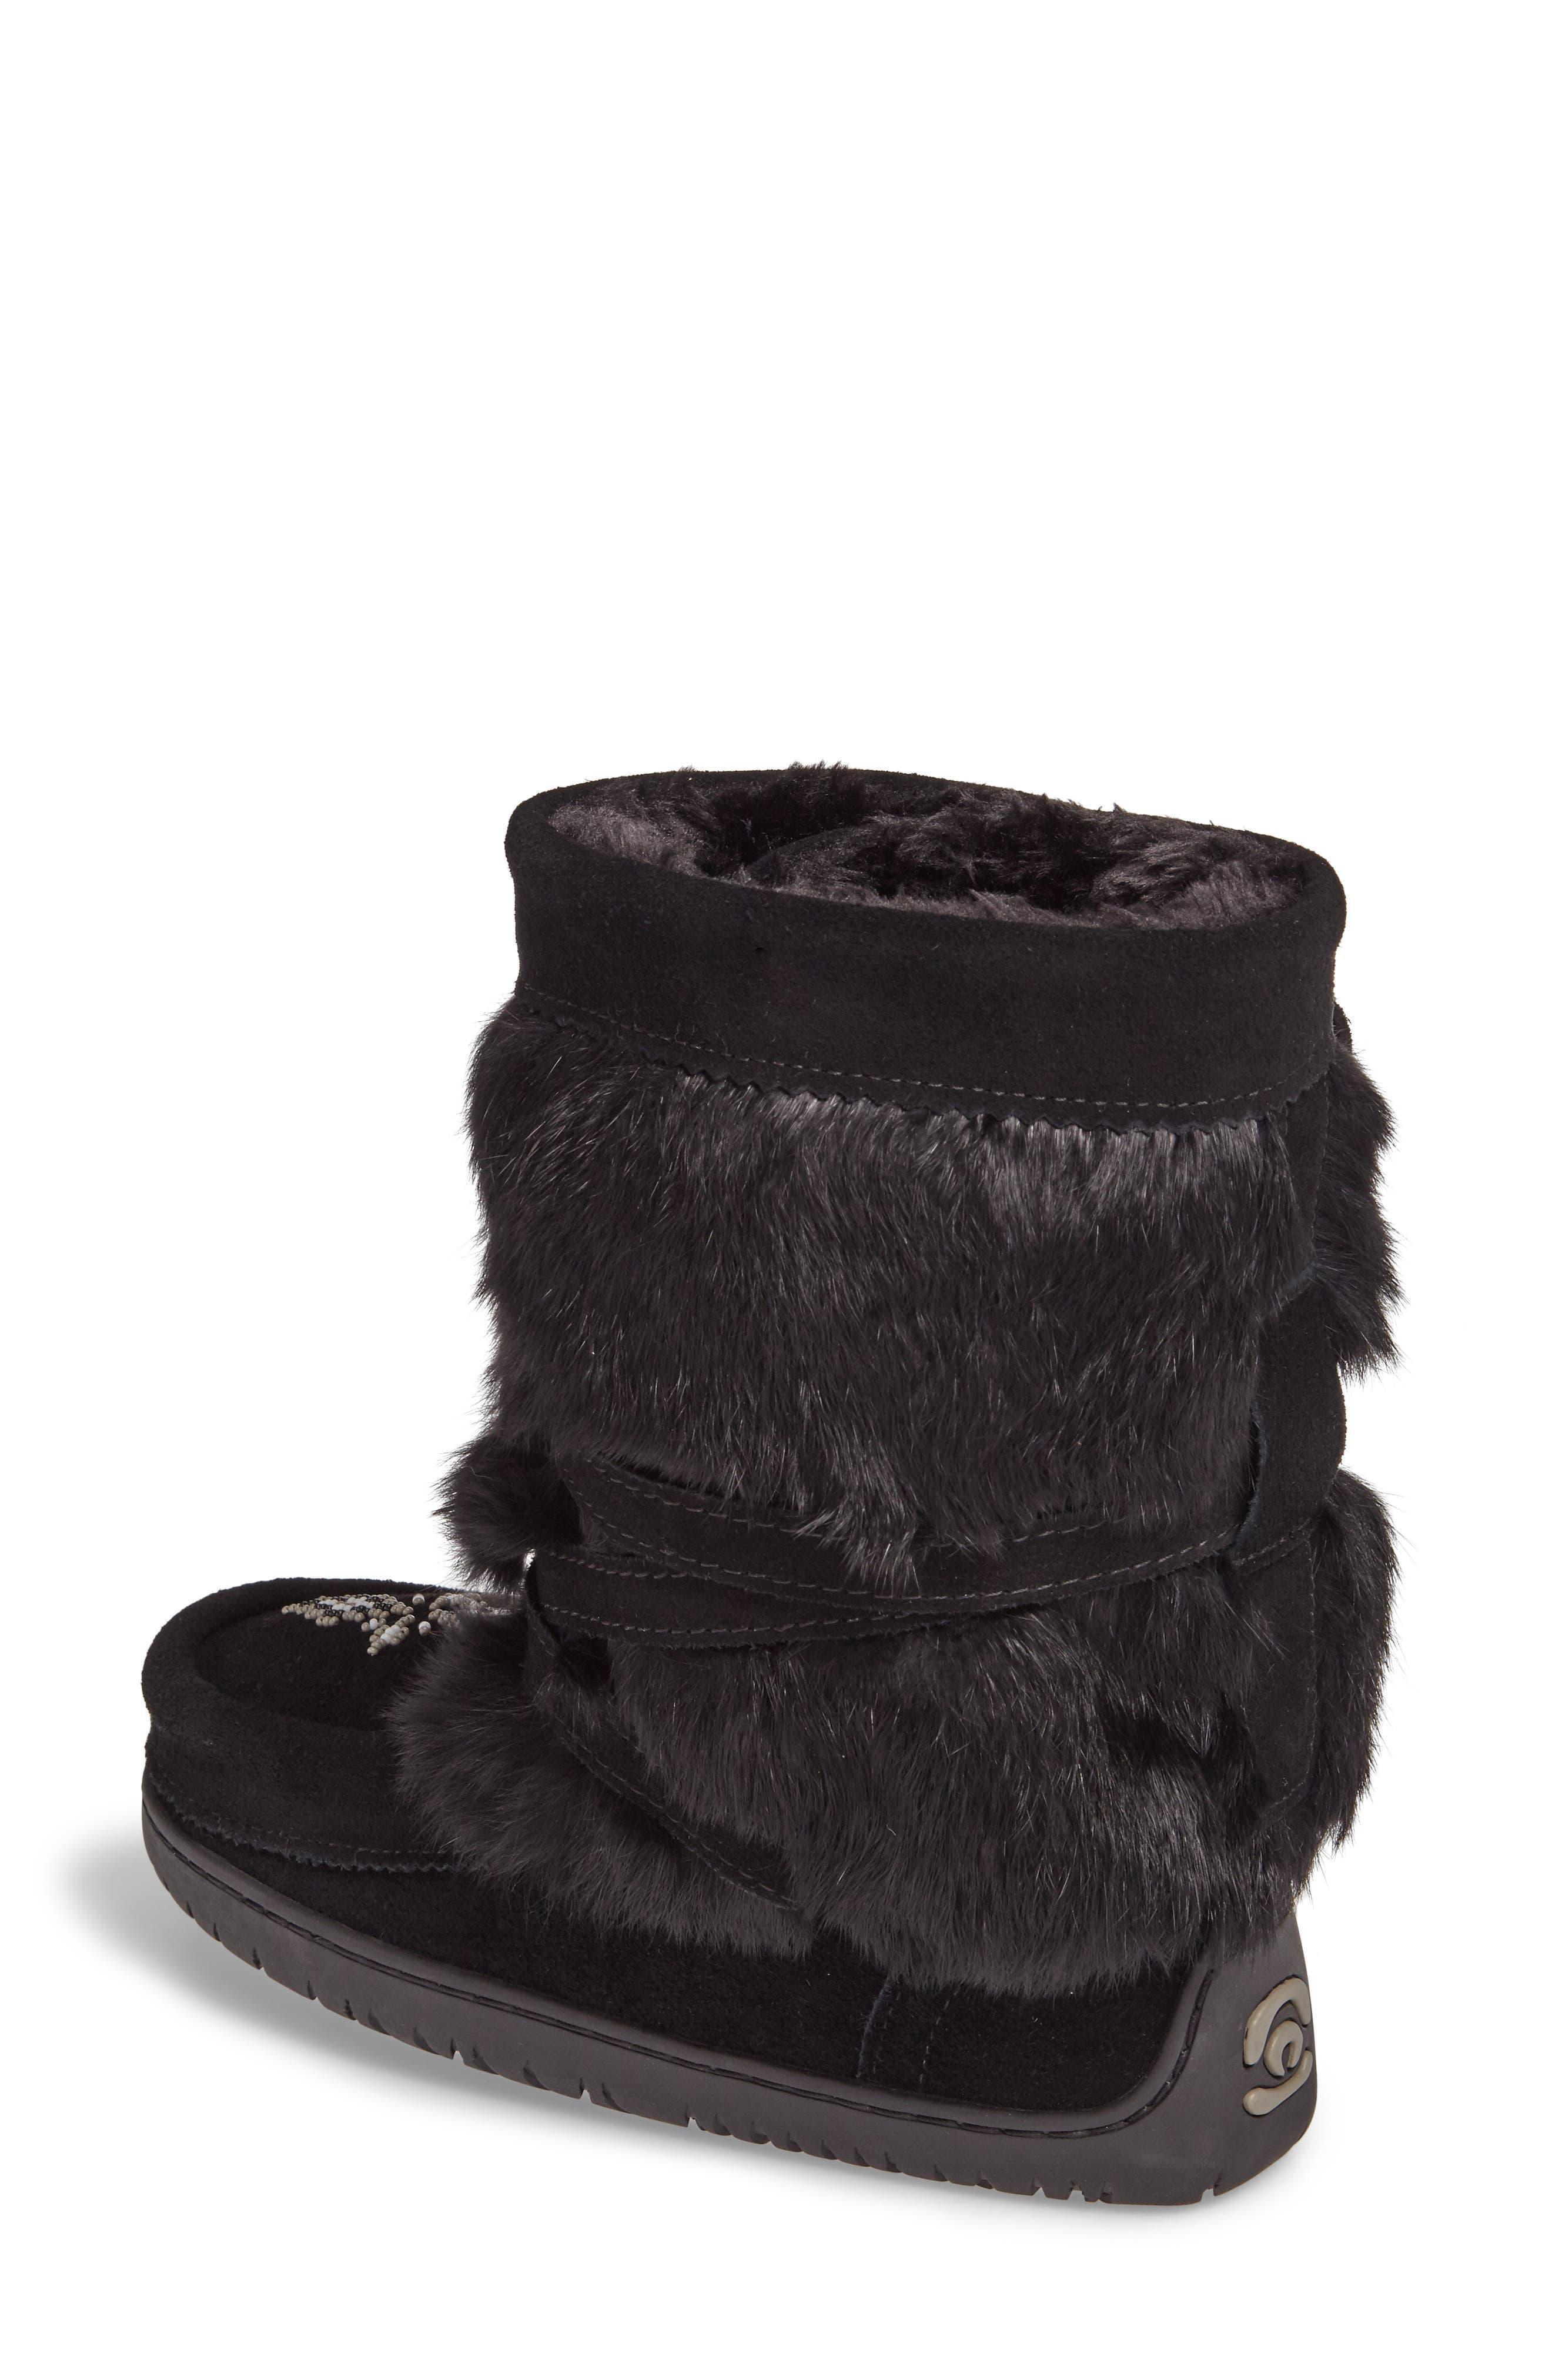 Beaded Short Wrap Genuine Rabbit Fur & Shearling Boot,                             Alternate thumbnail 3, color,